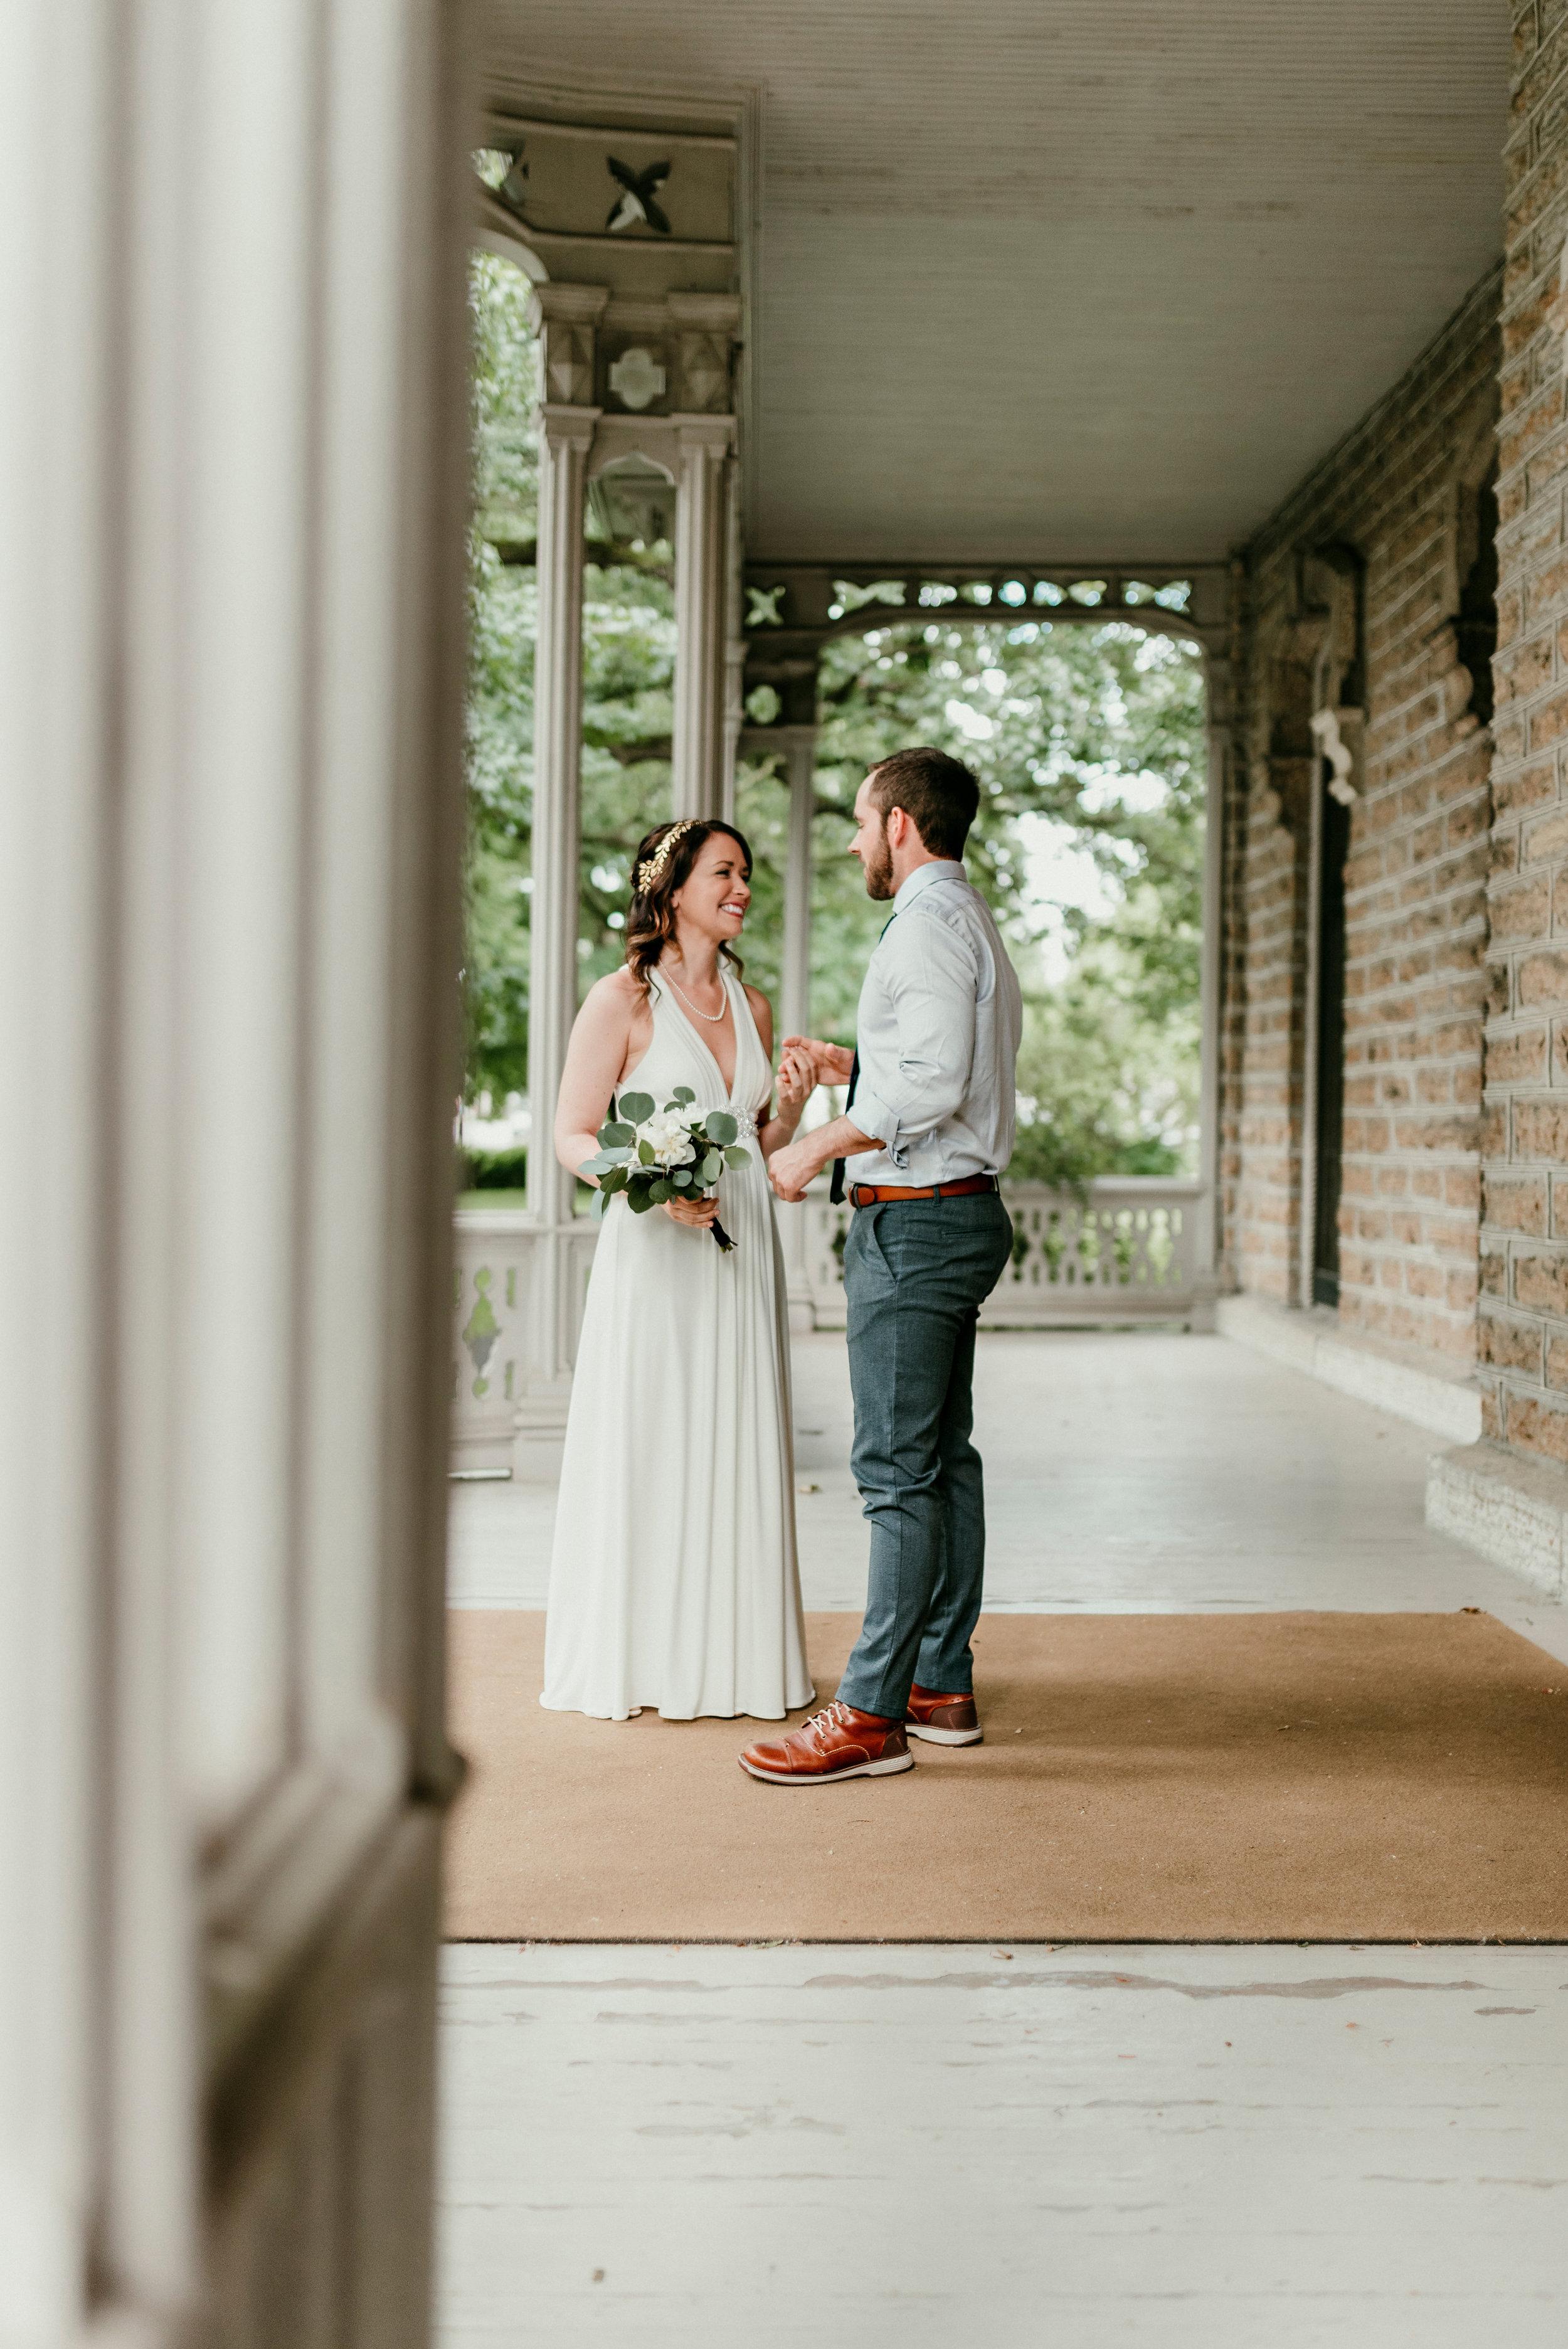 a peek at bride and groom